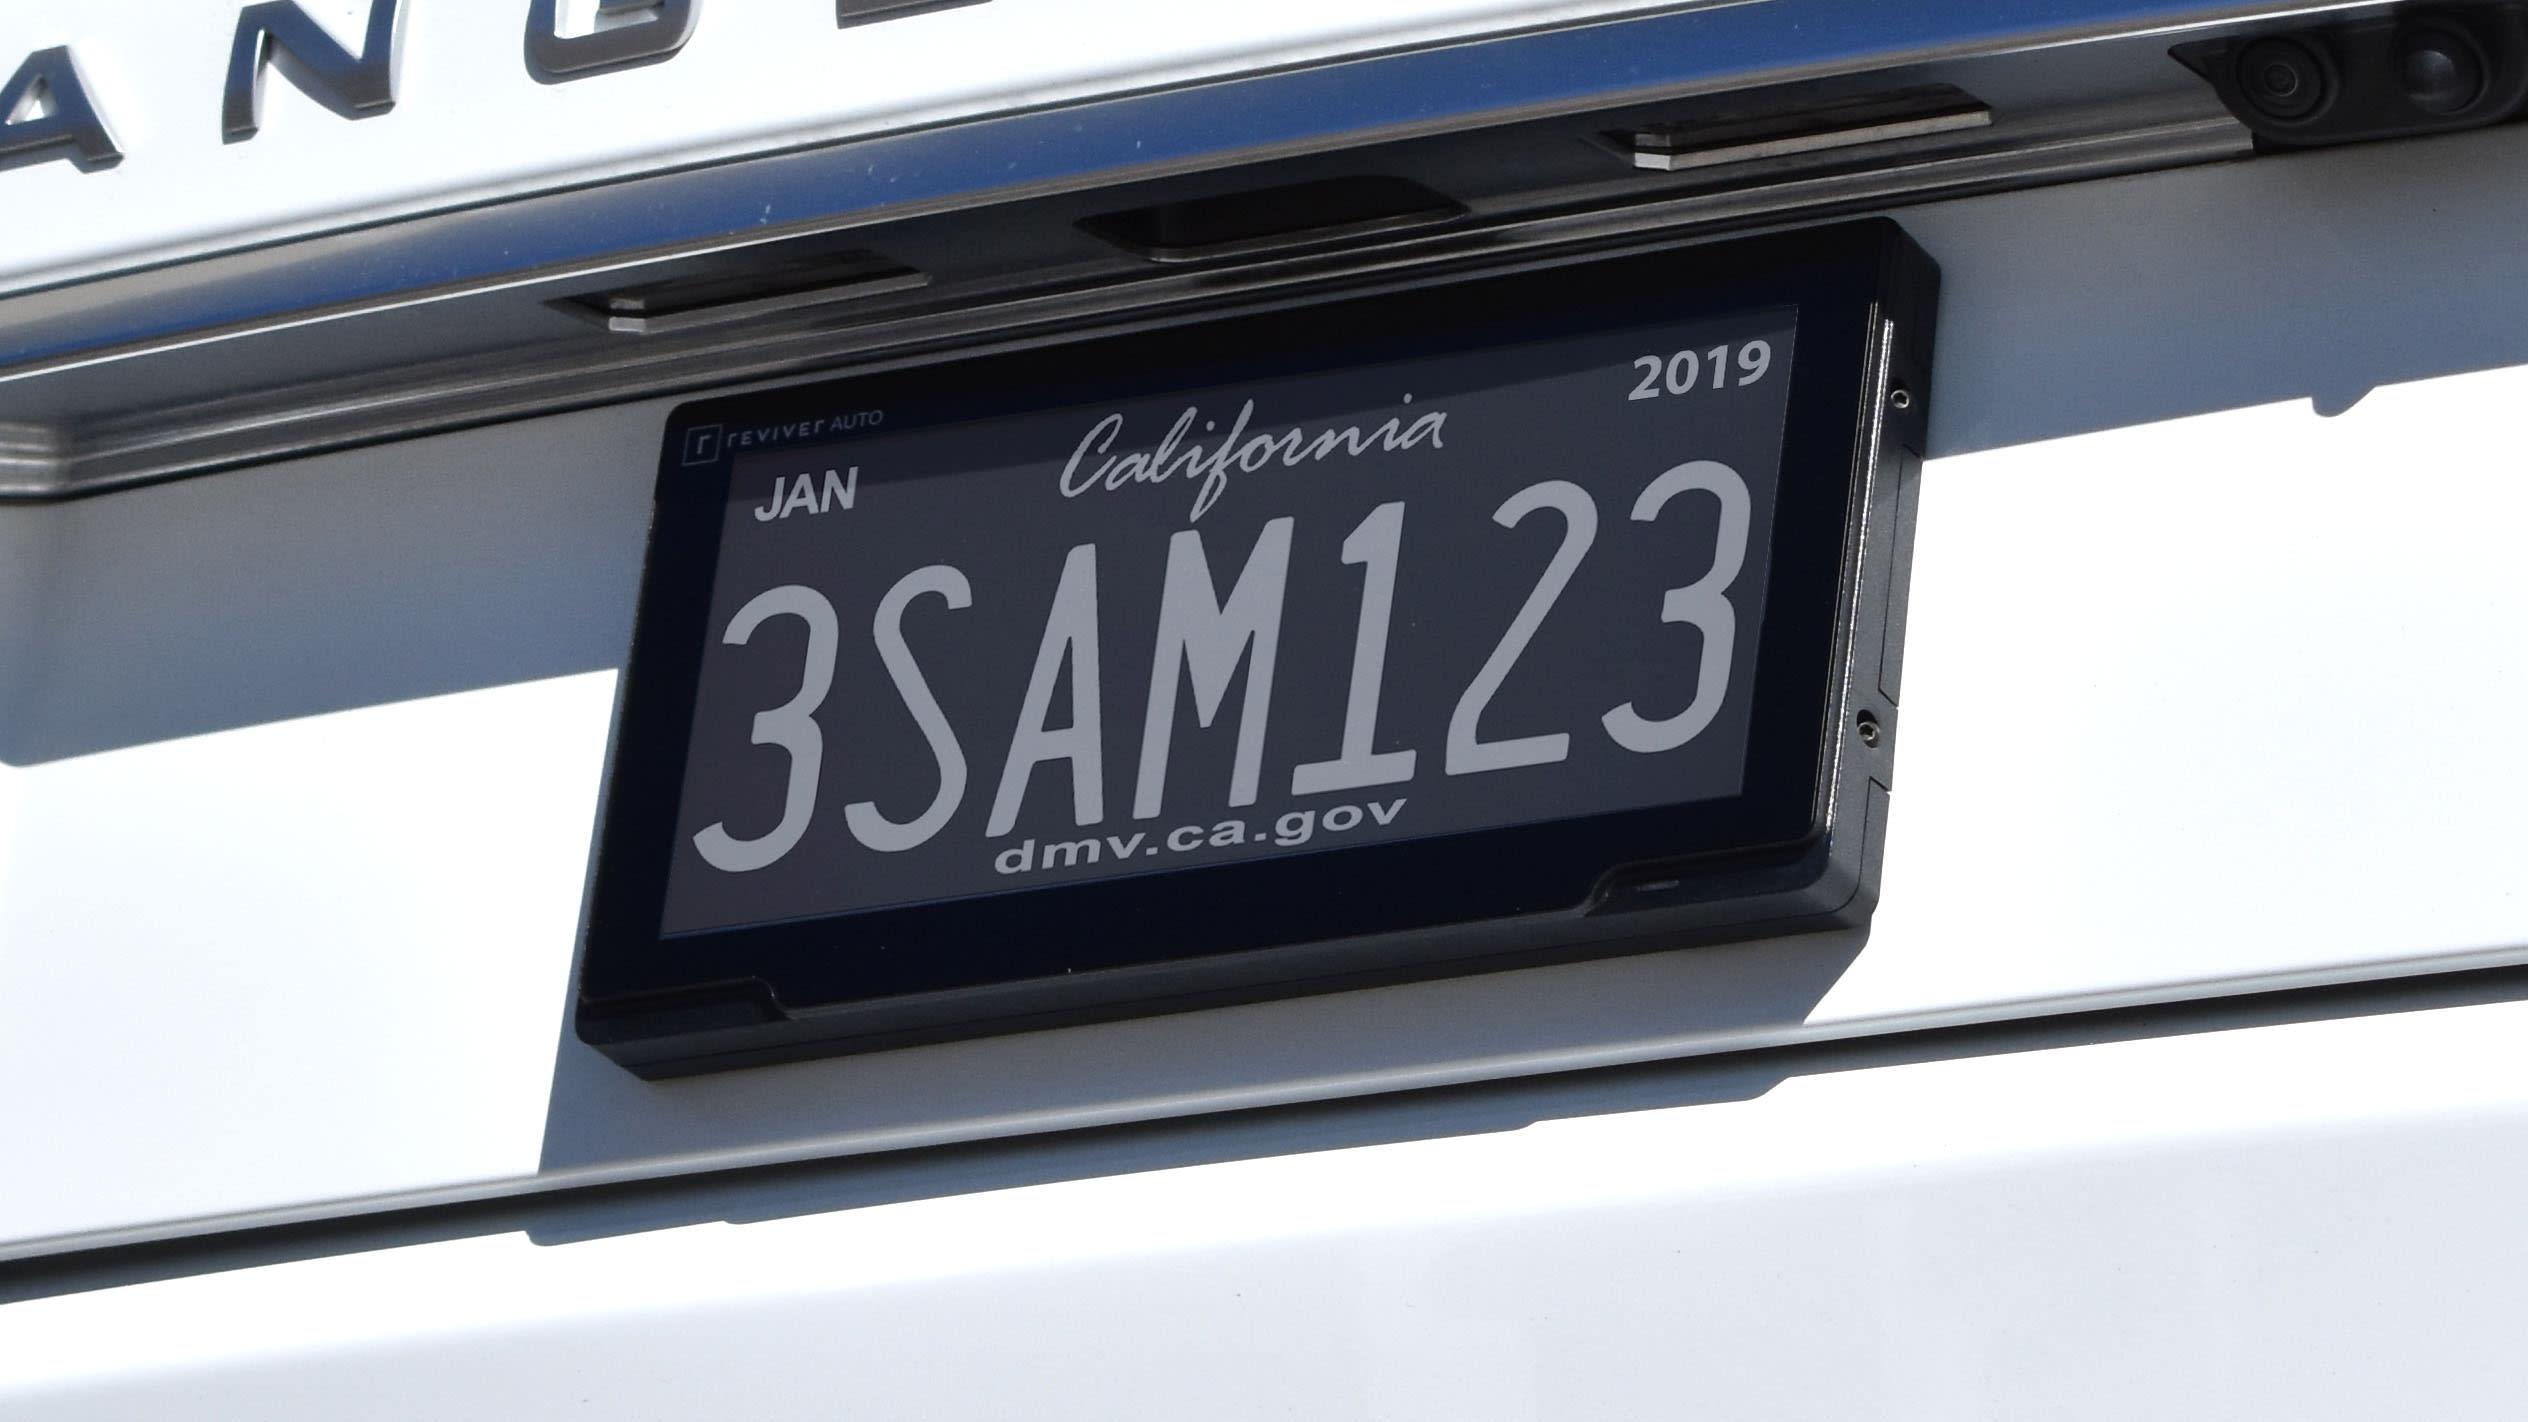 california digital number plate reviver auto